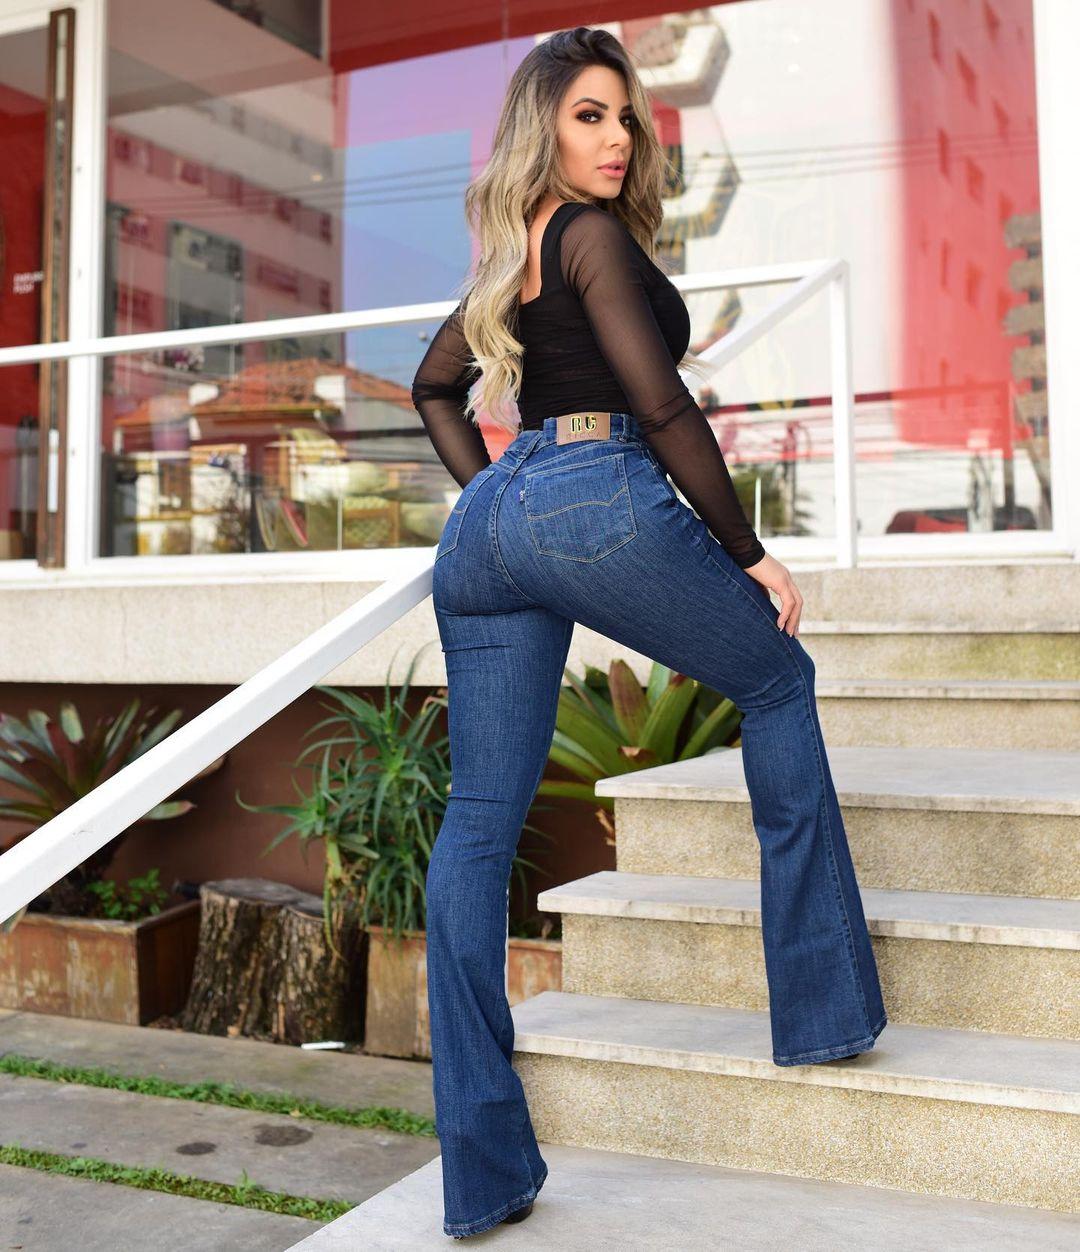 Fernanda-Hernandes-Wallpapers-Insta-Fit-Bio-5